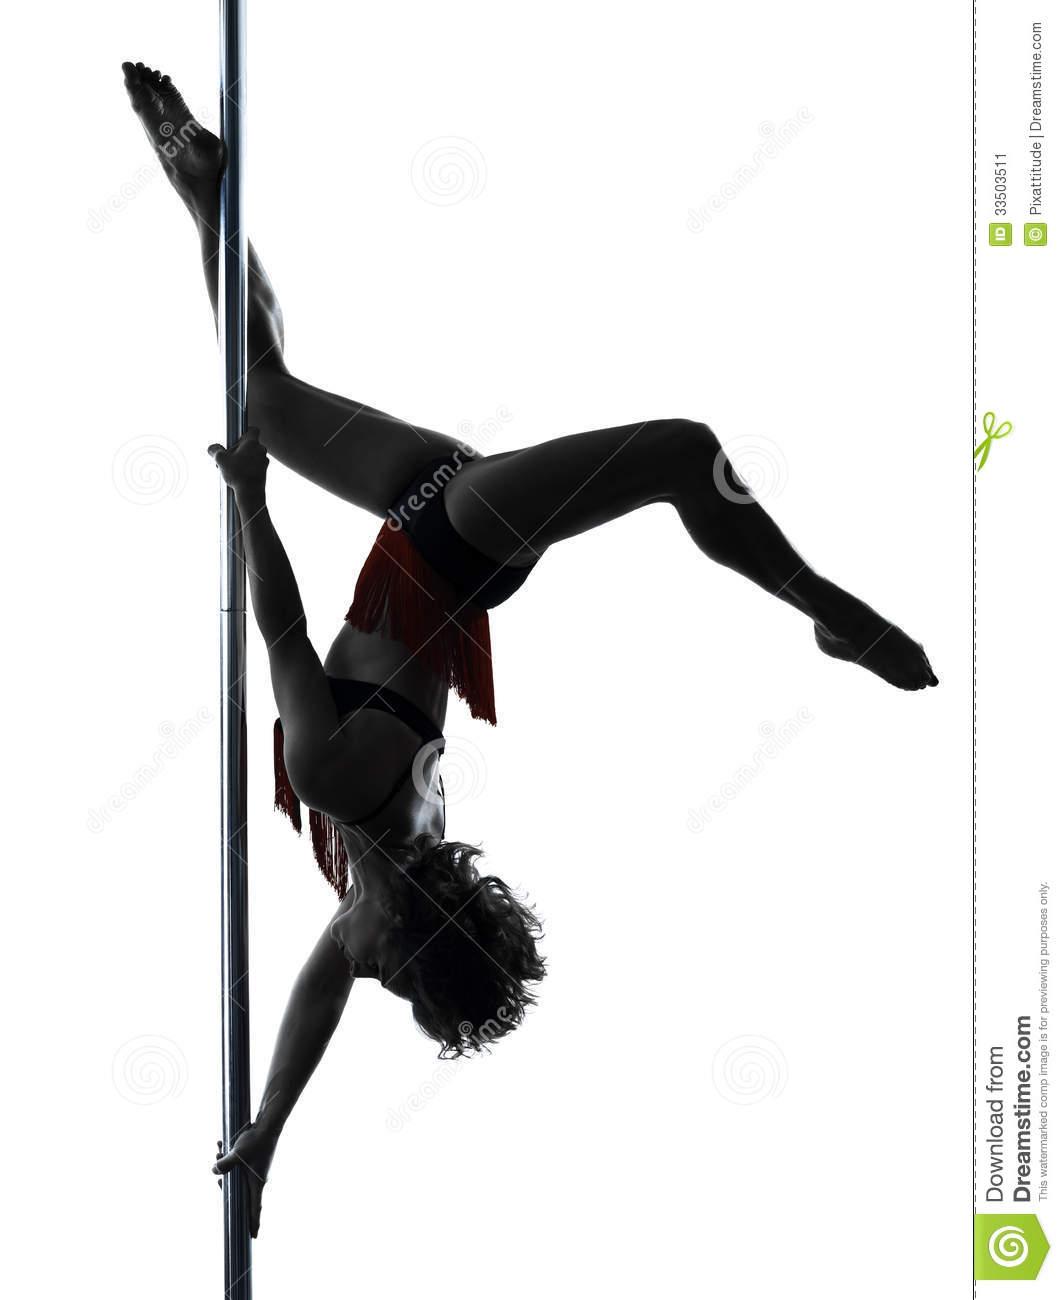 Pole Dancing Clipart.